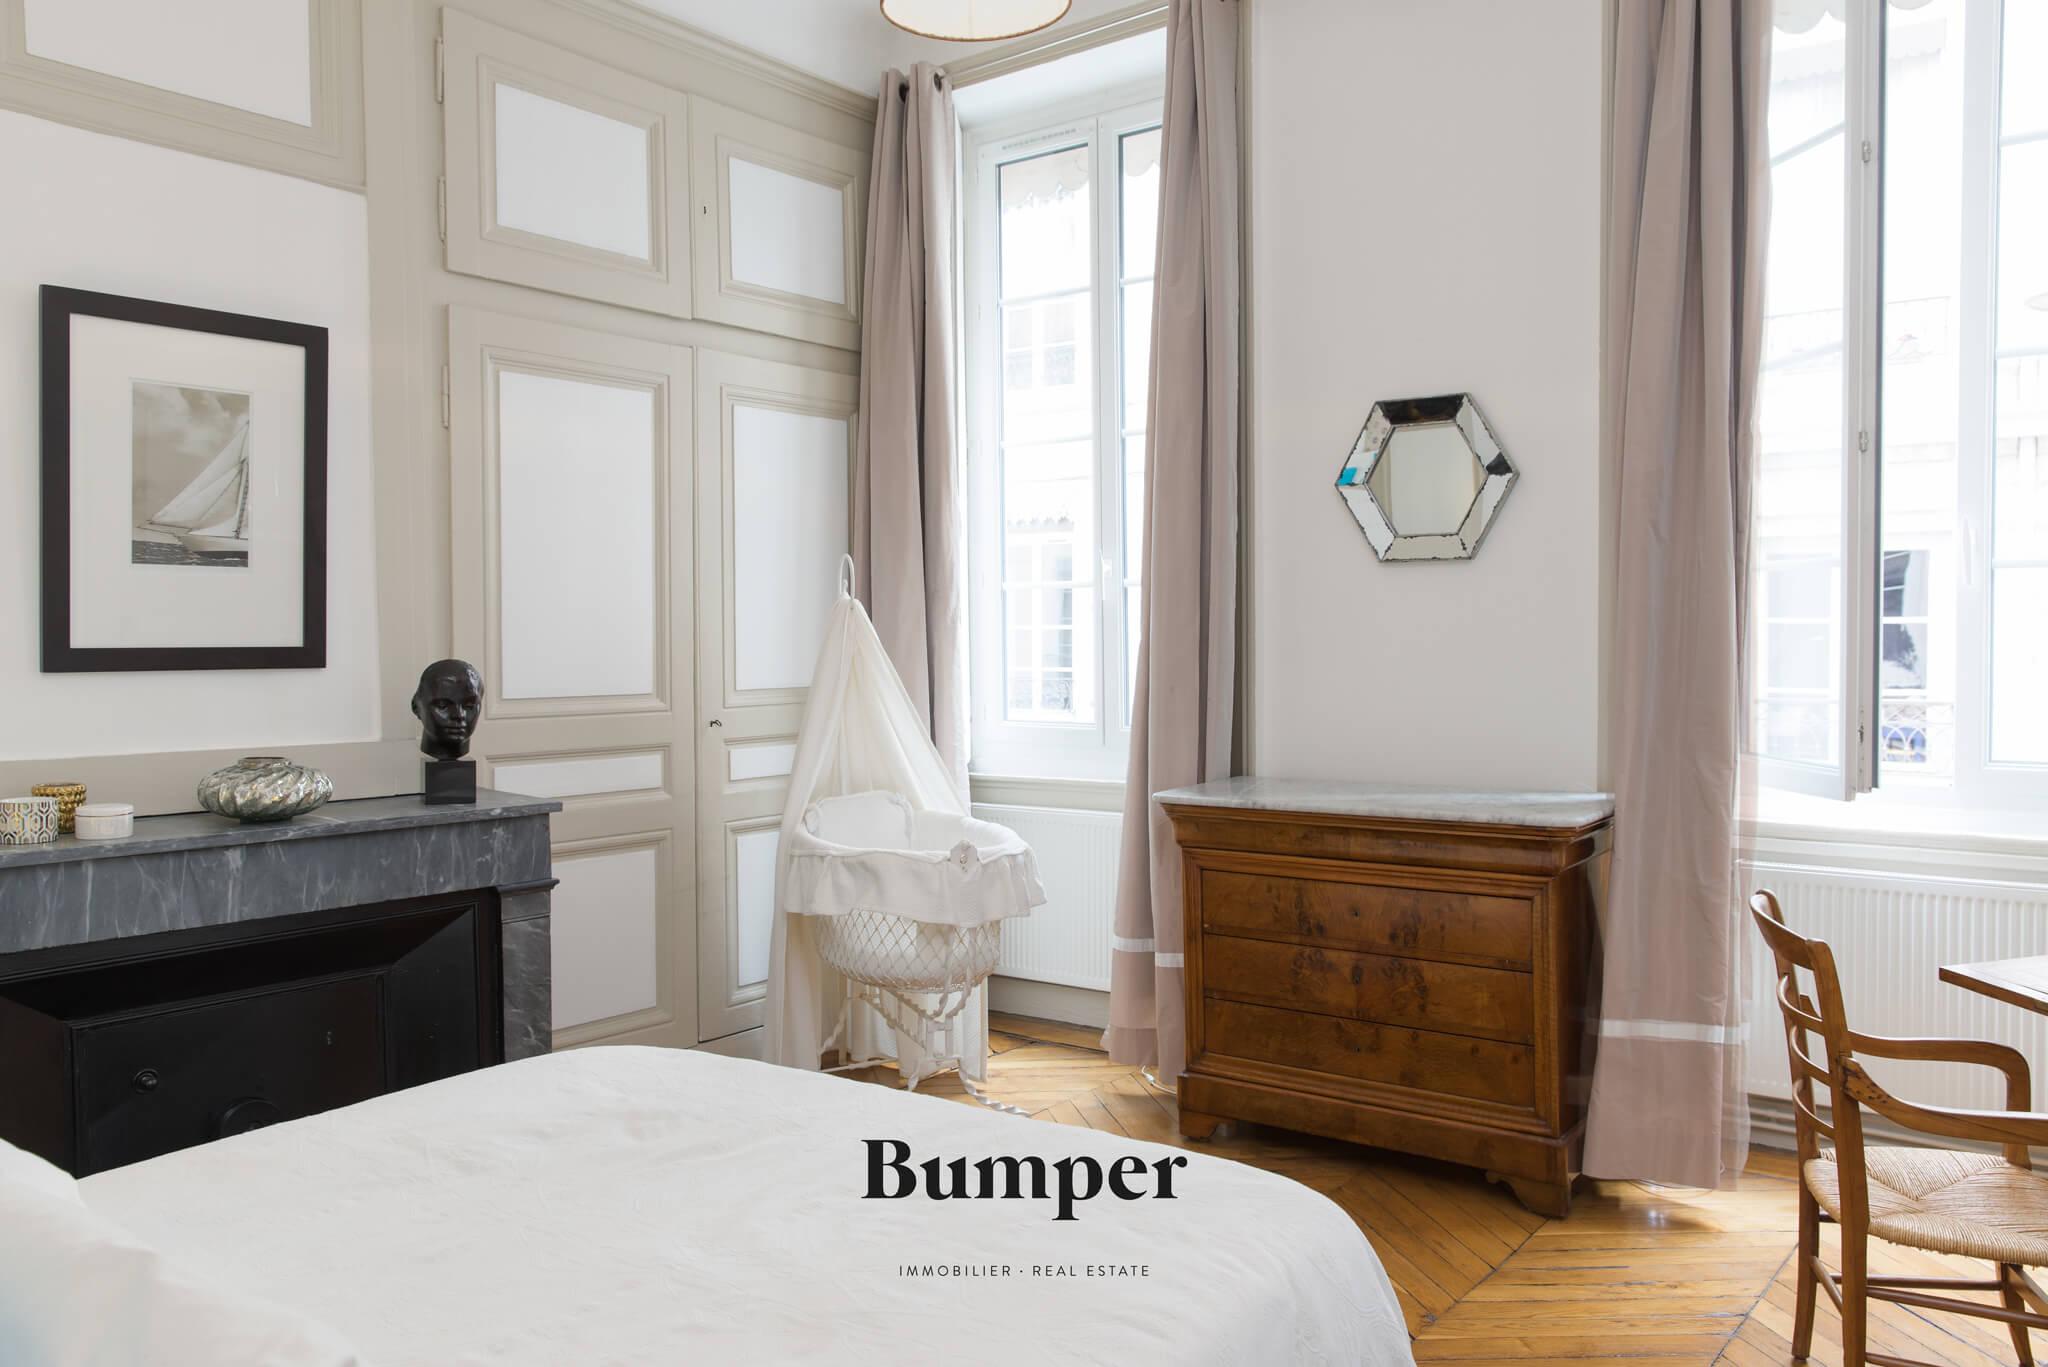 bumper-vendu-appartement-maison-immobilier15.jpg